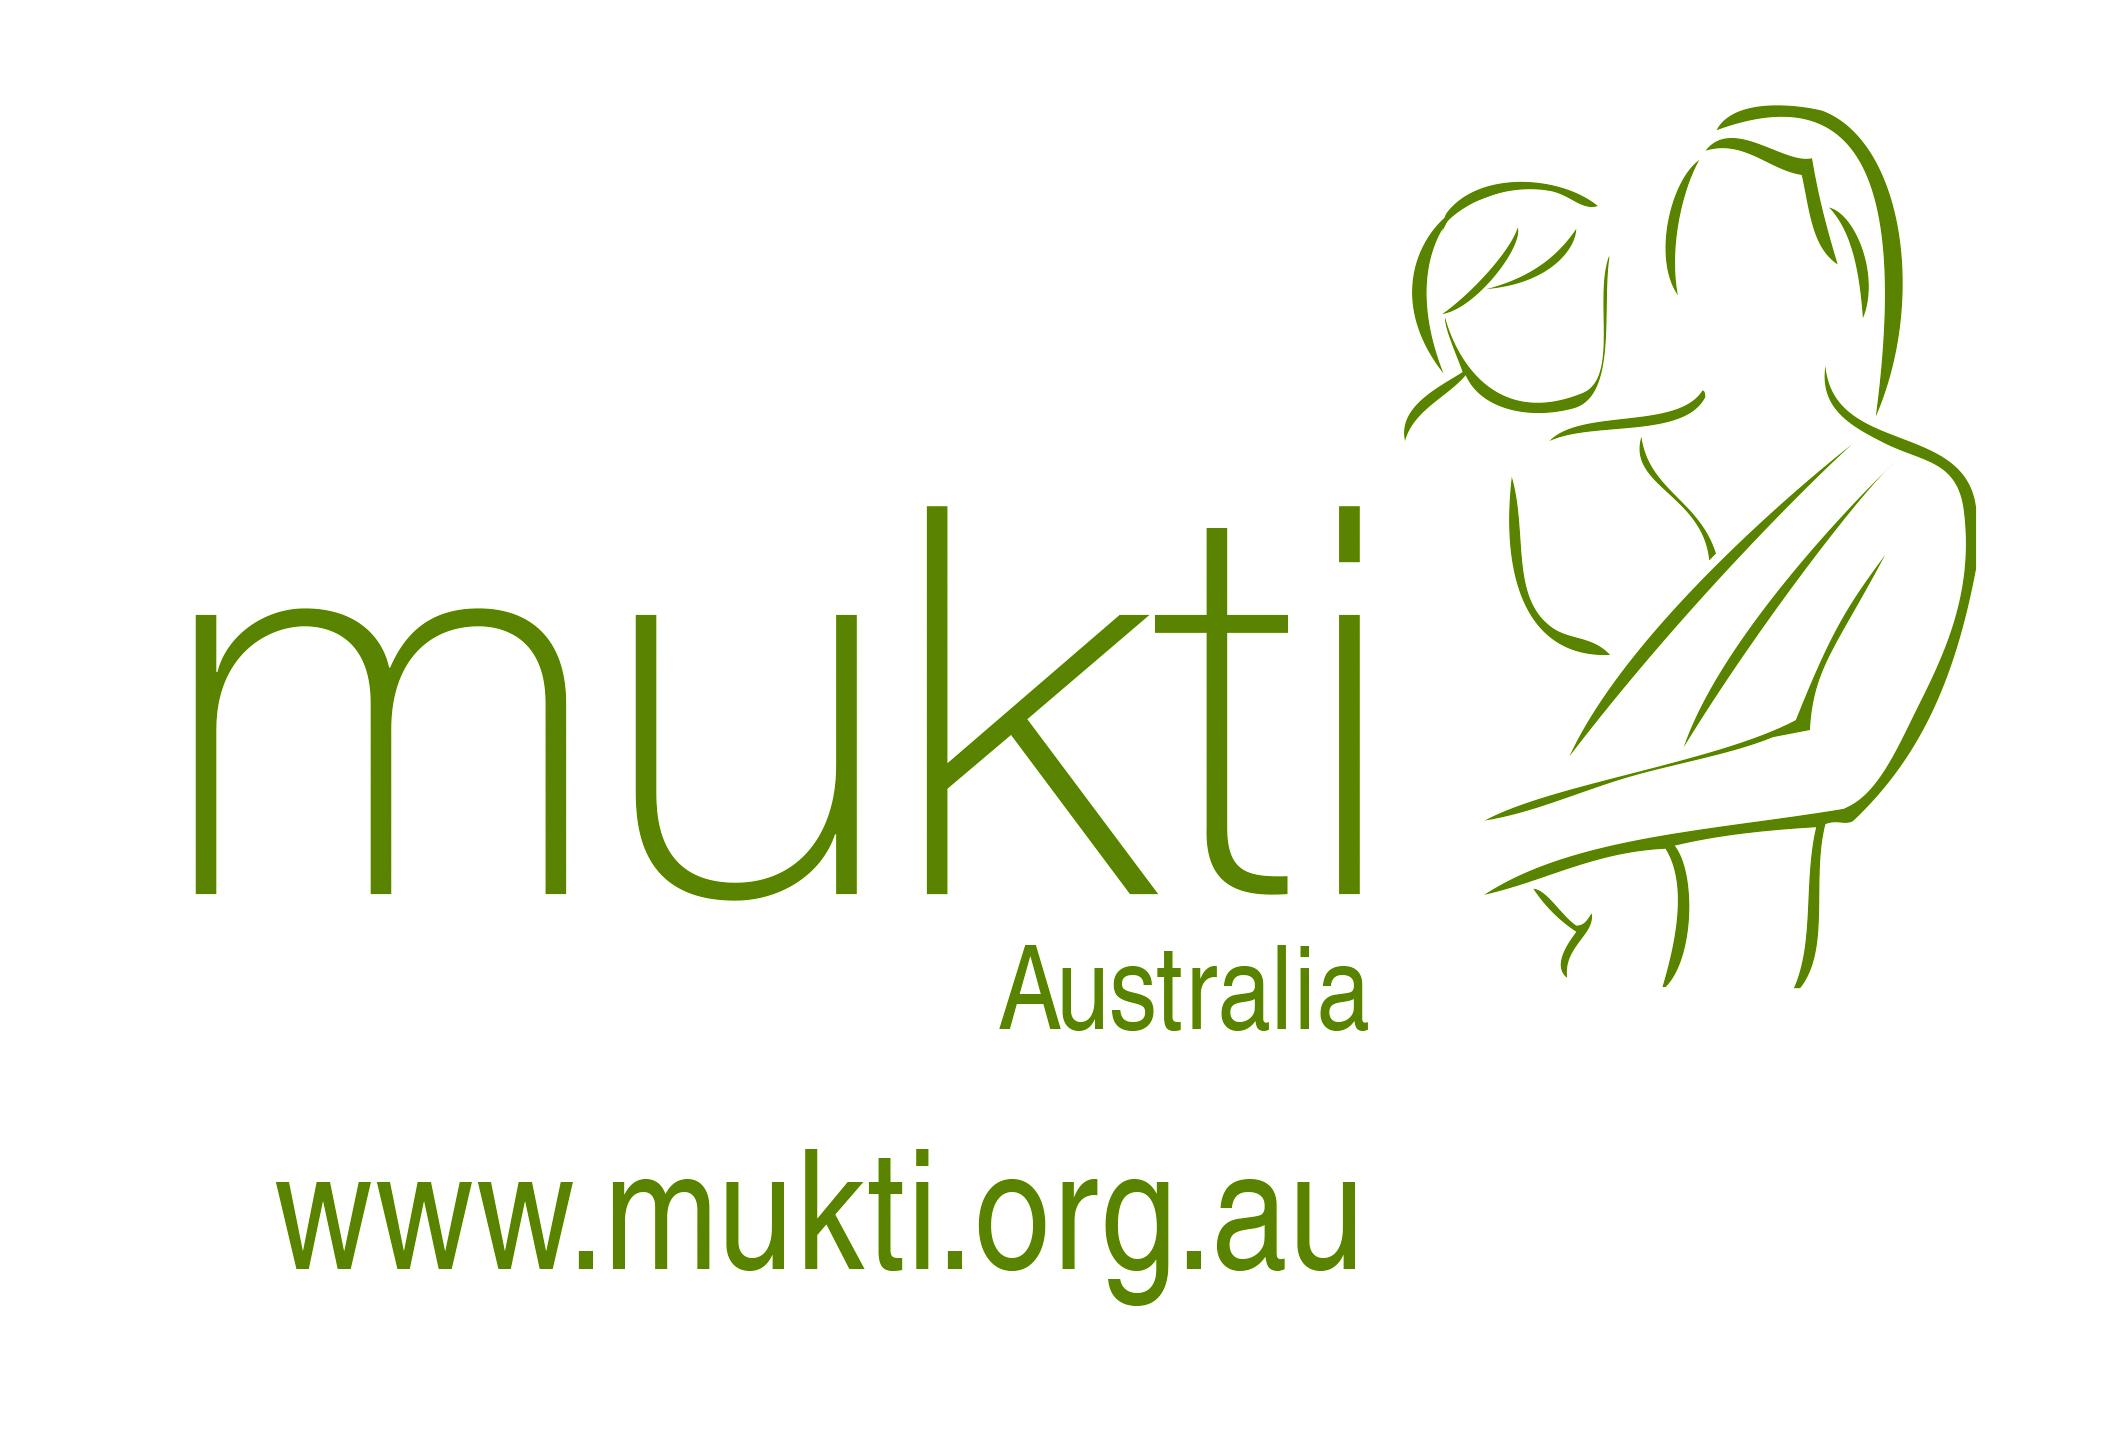 mukti_logo_green Converted.jpg